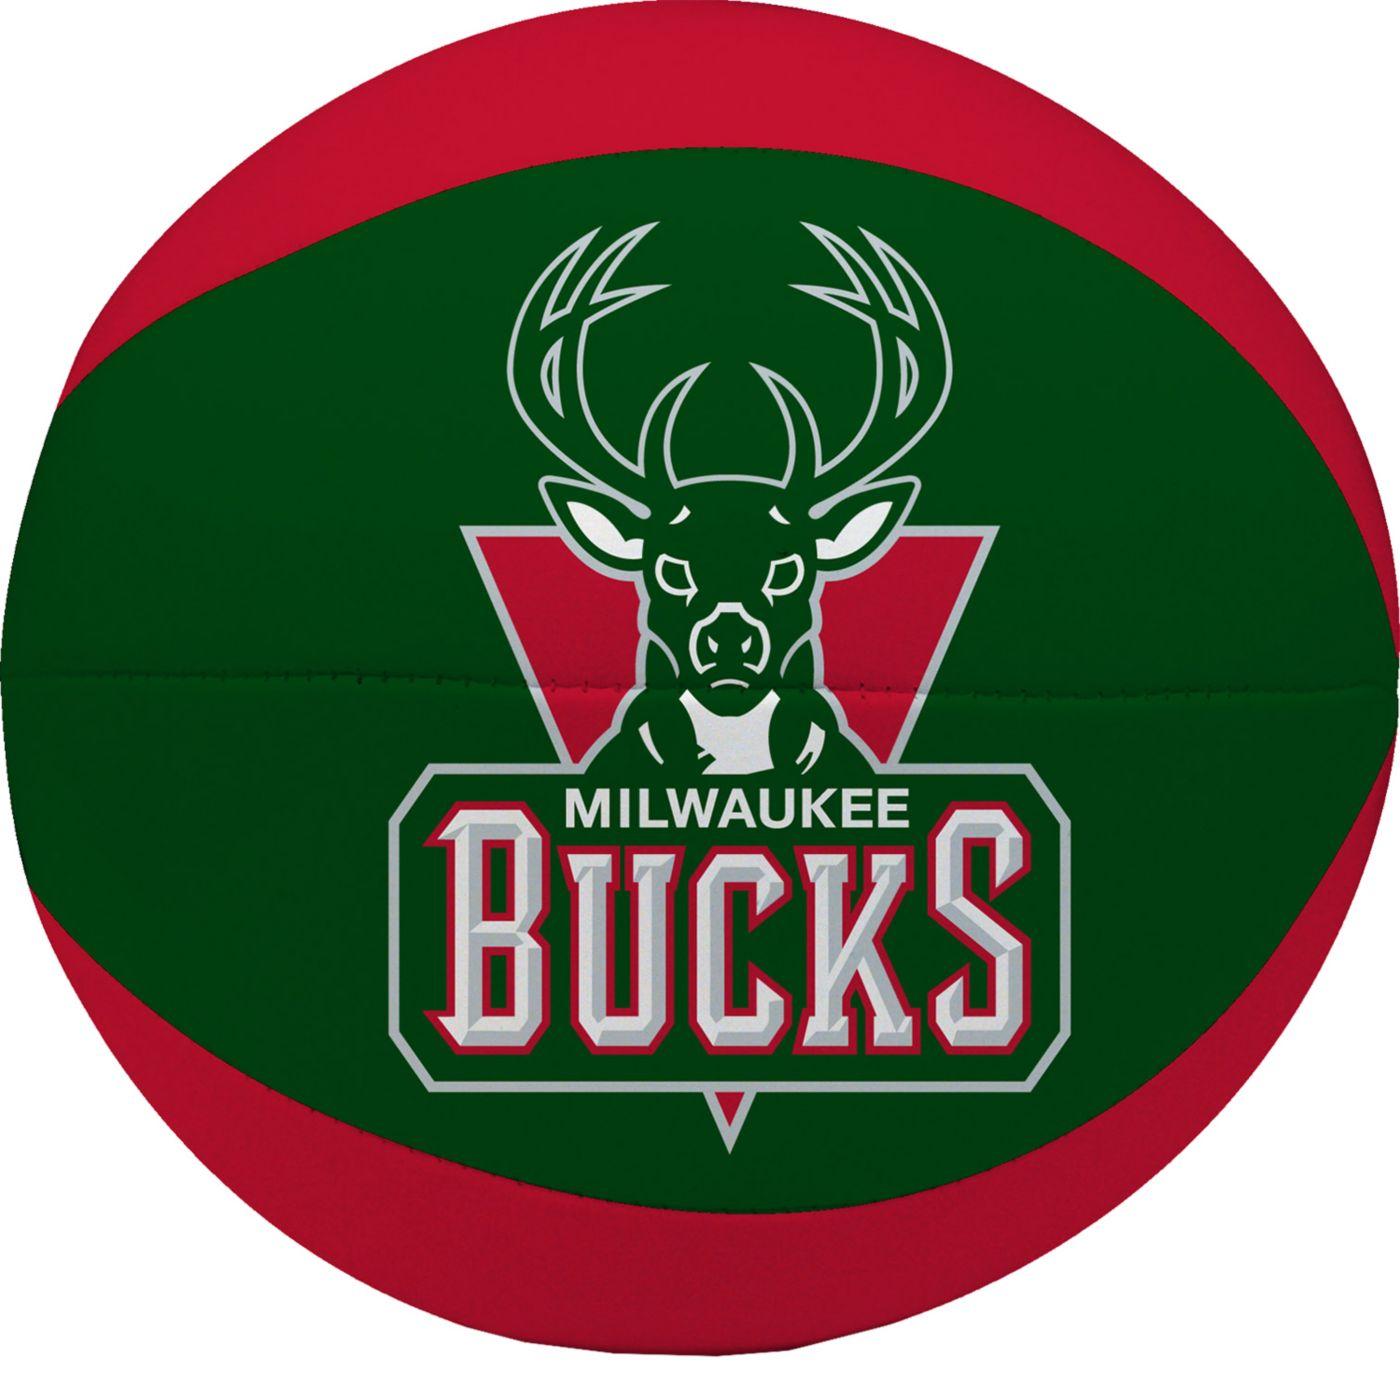 "Rawlings Milwaukee Bucks 4"" Softee Basketball"